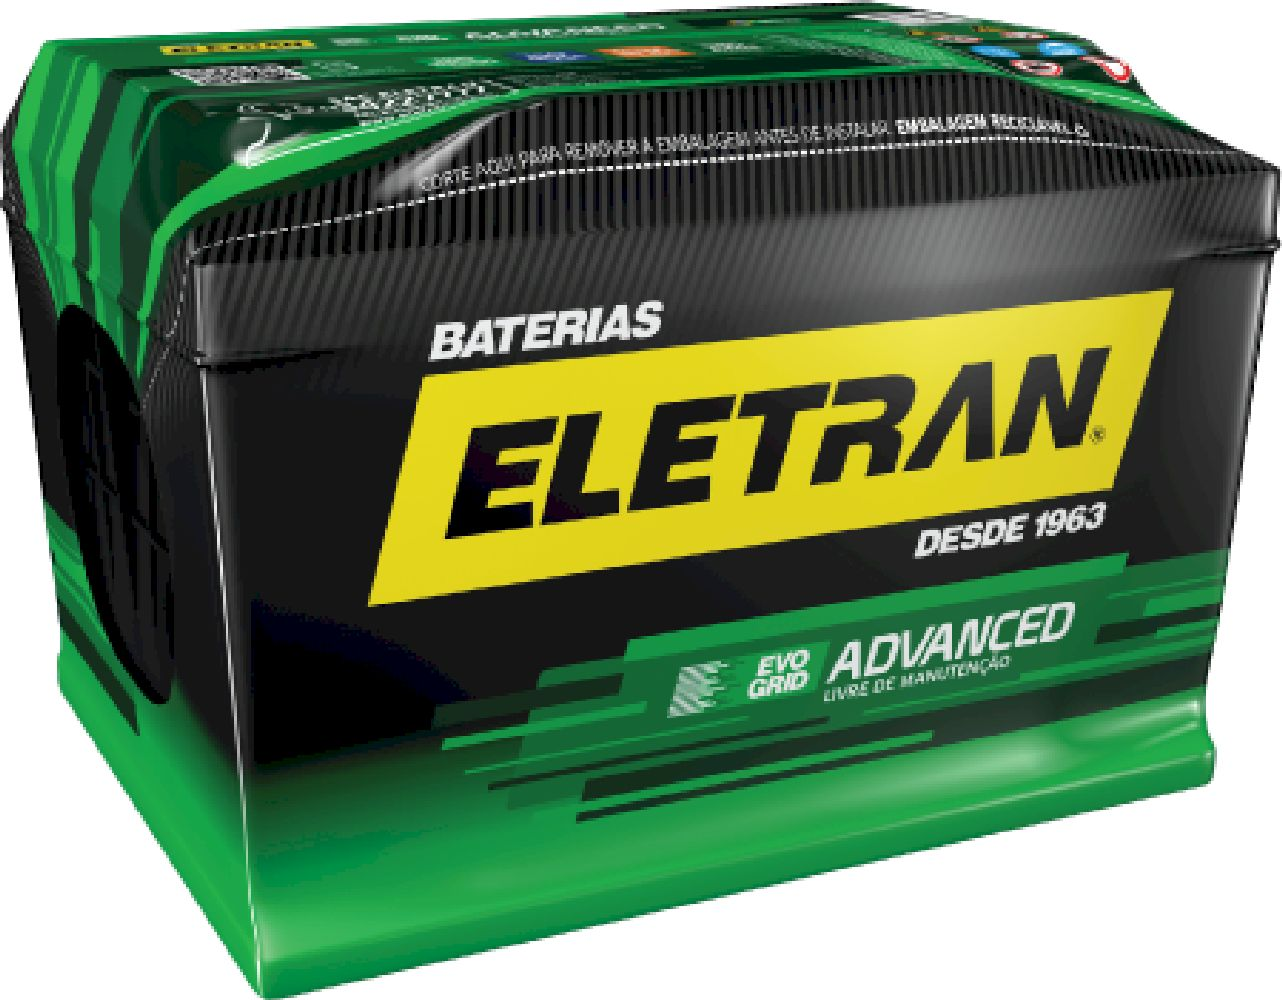 Bateria Automotiva Eletran Advanced - 75 PD